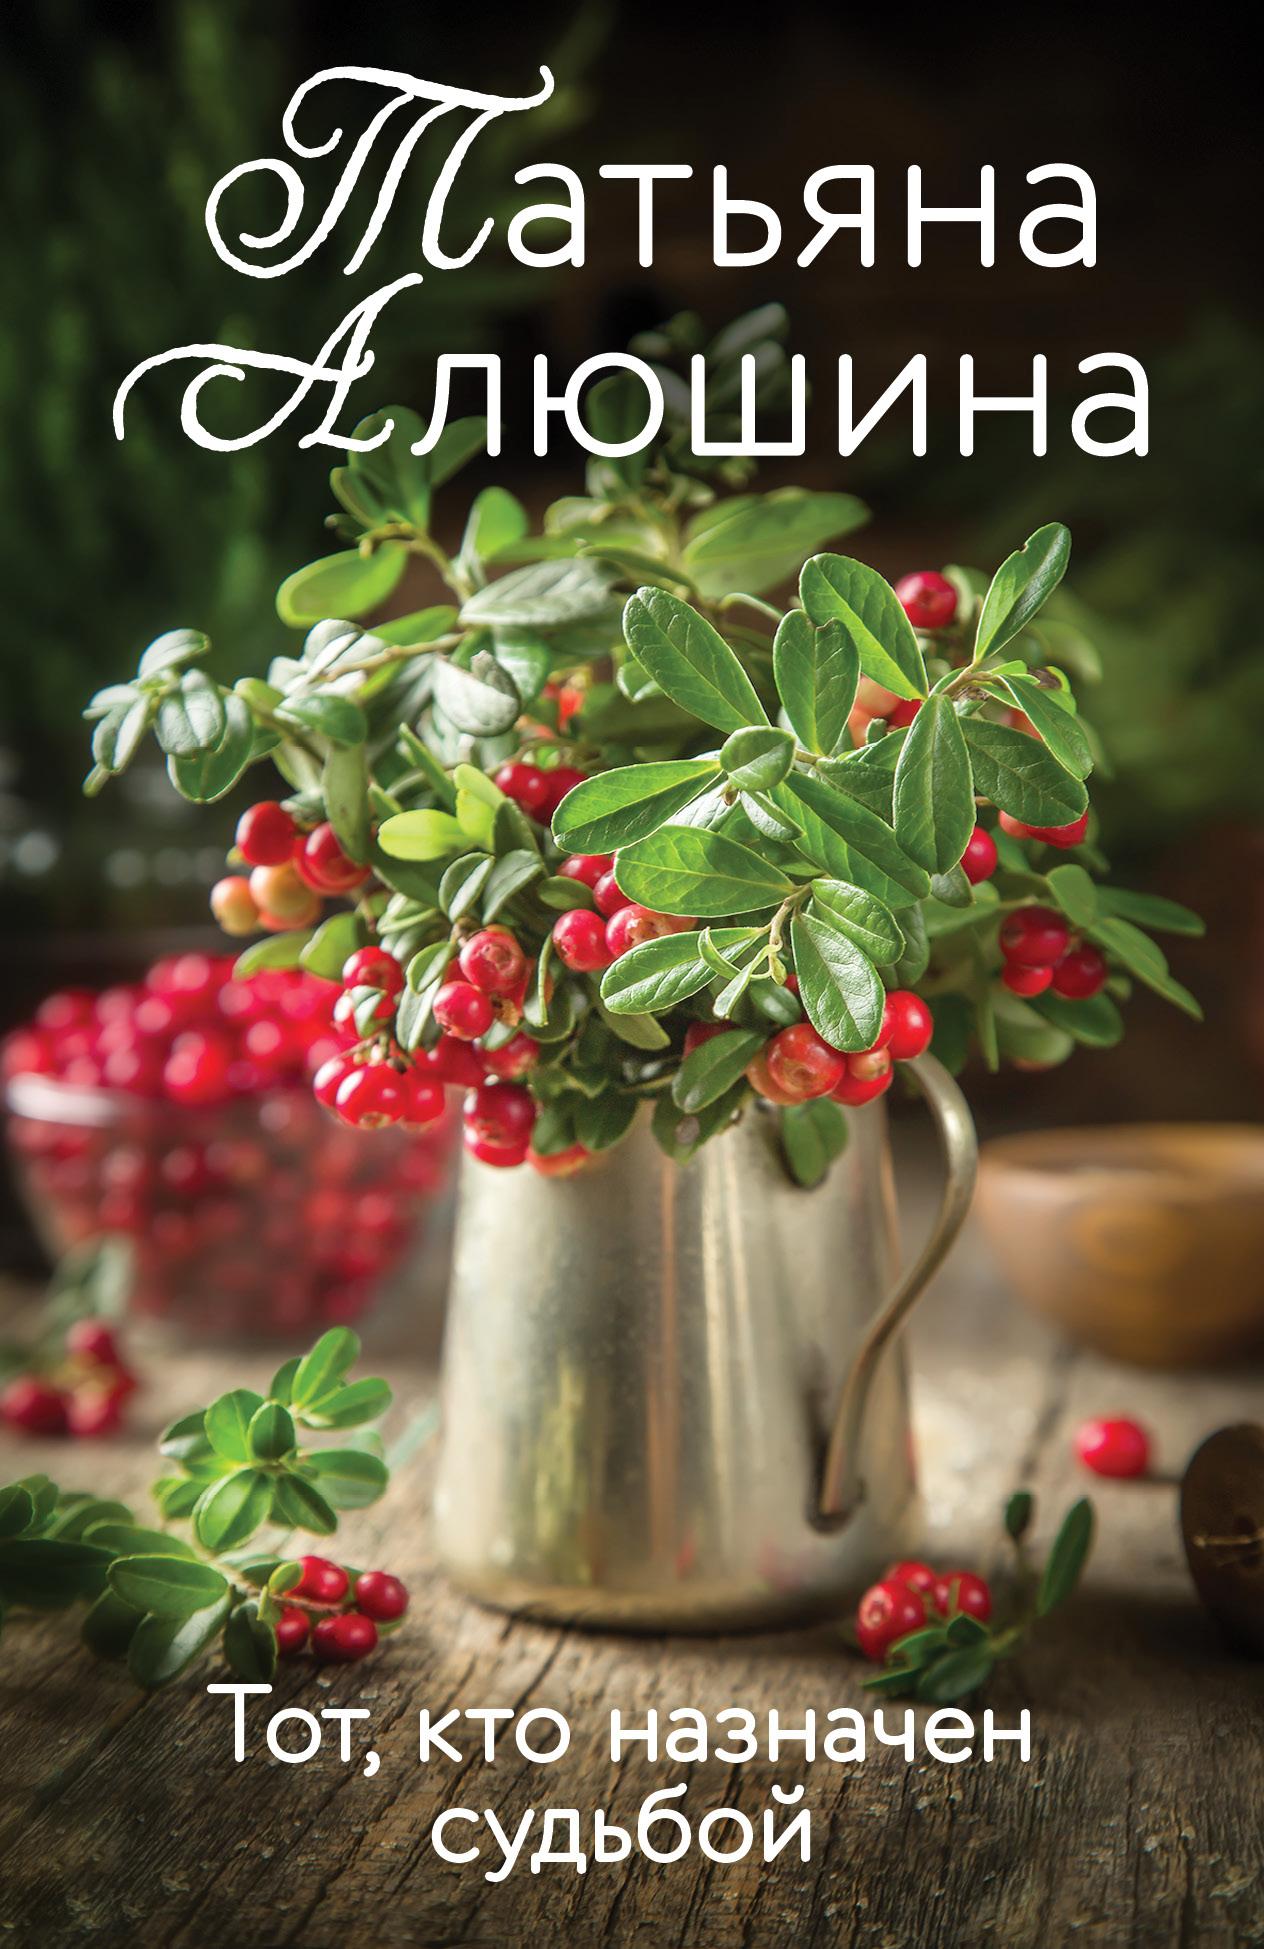 Татьяна Алюшина Тот, кто назначен судьбой алюшина т тот кто назначен судьбой